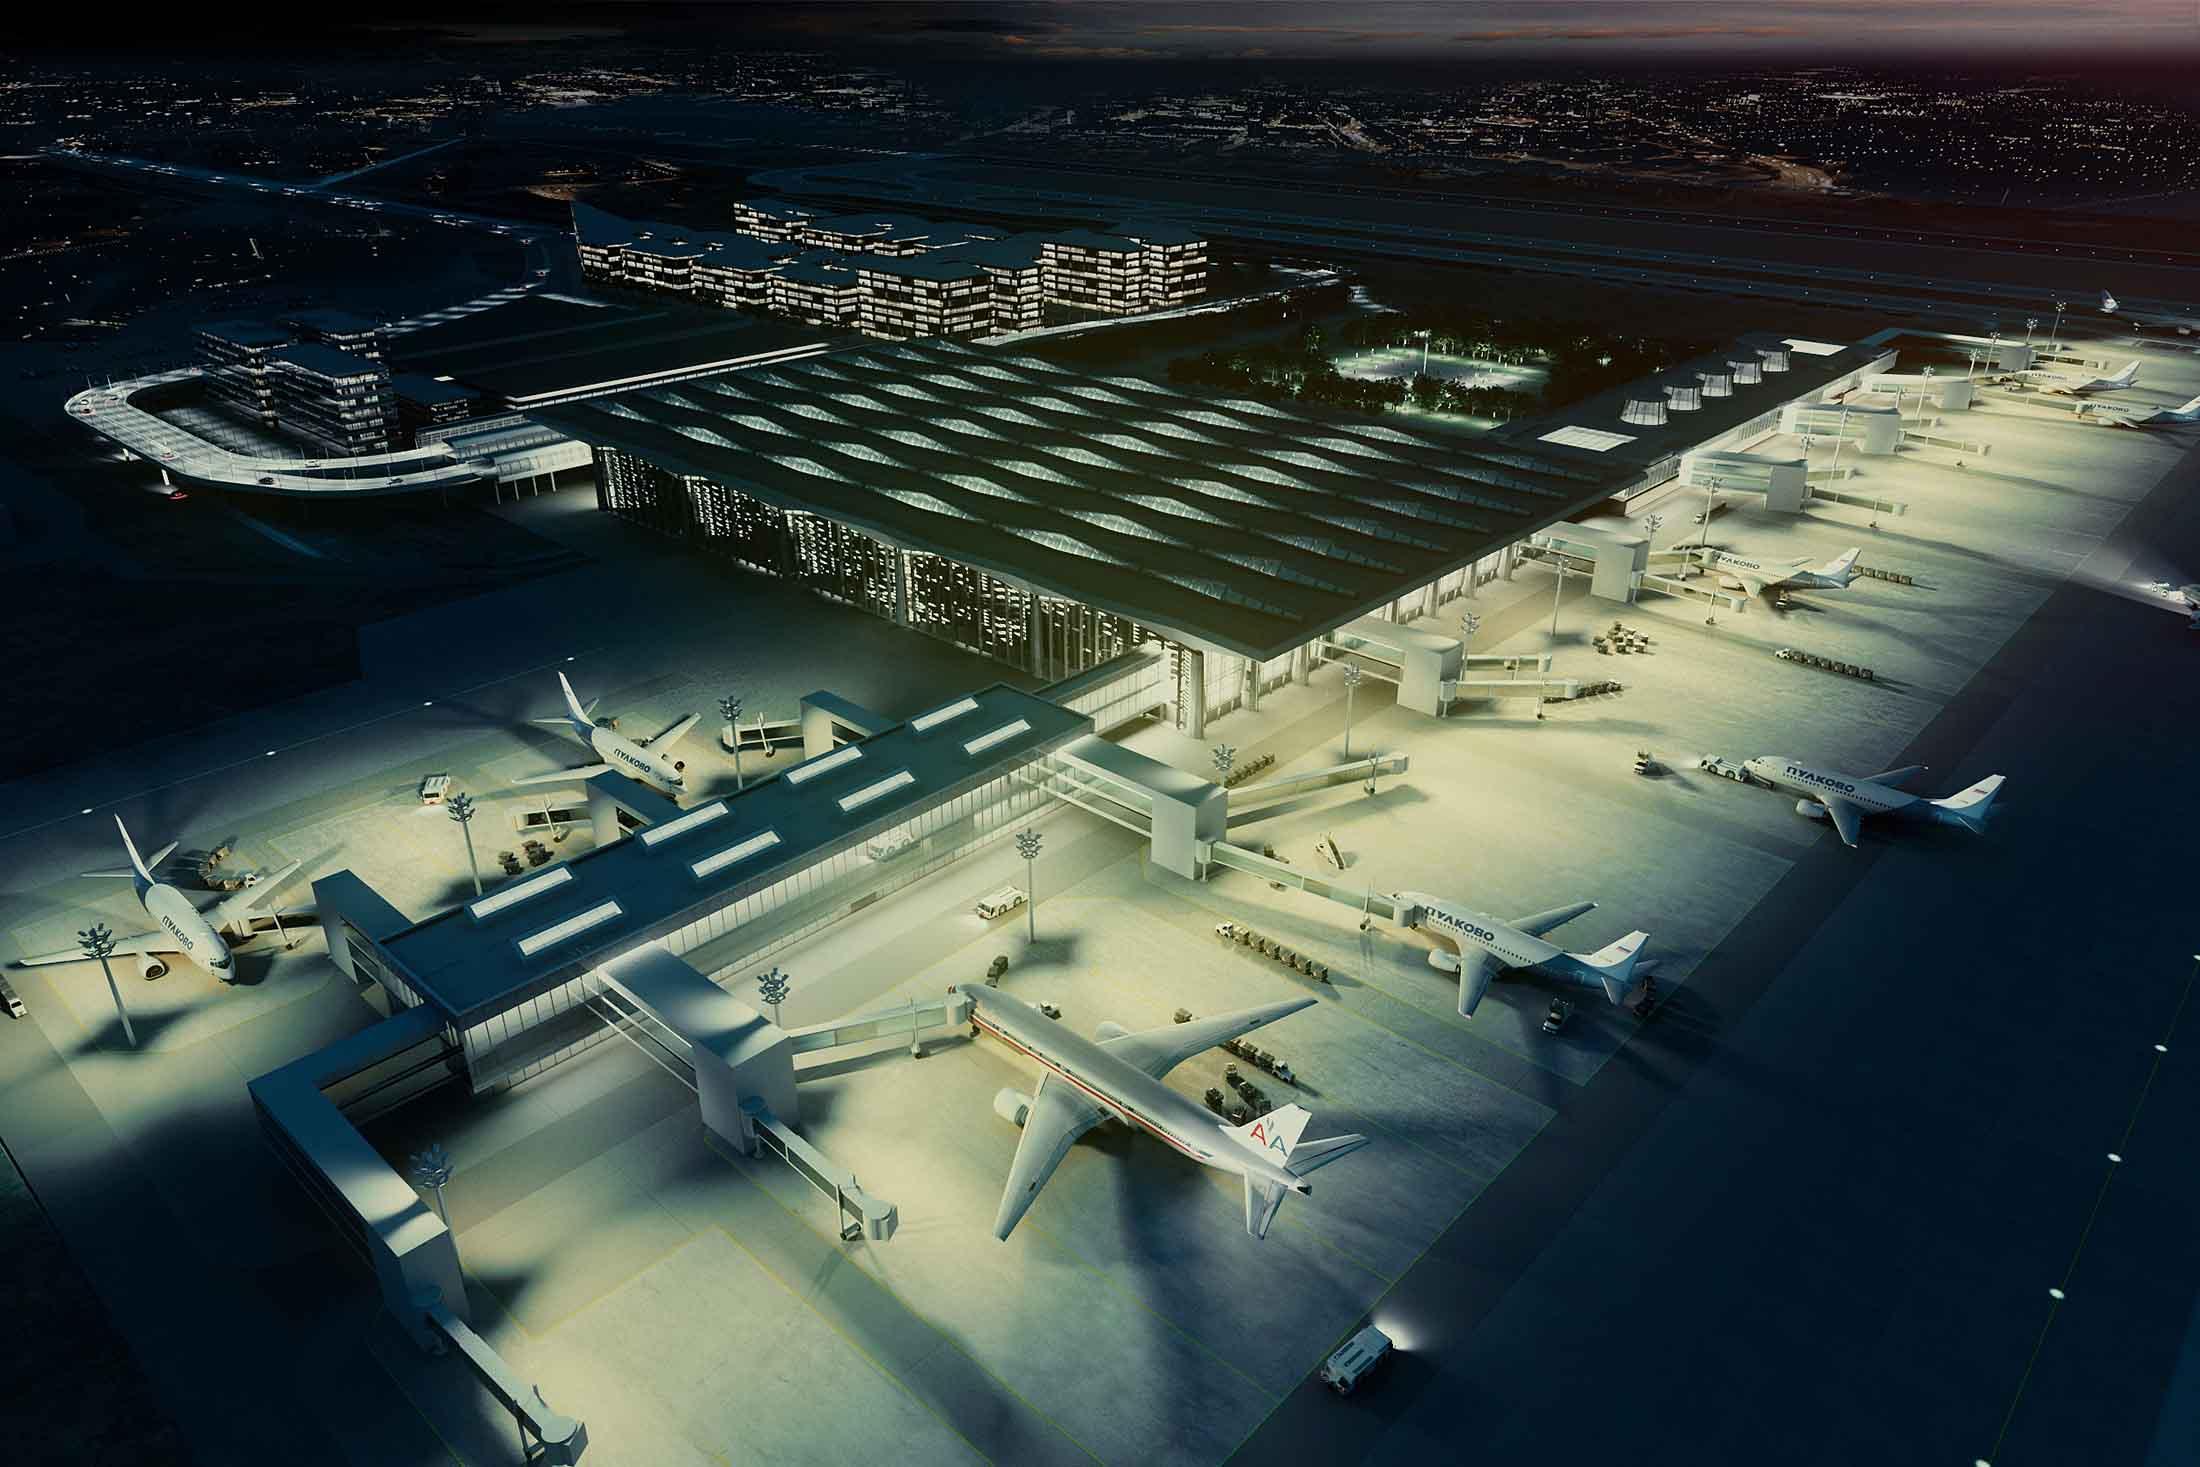 PULKOVO AIRPORT - (ST.PETERSBURG)